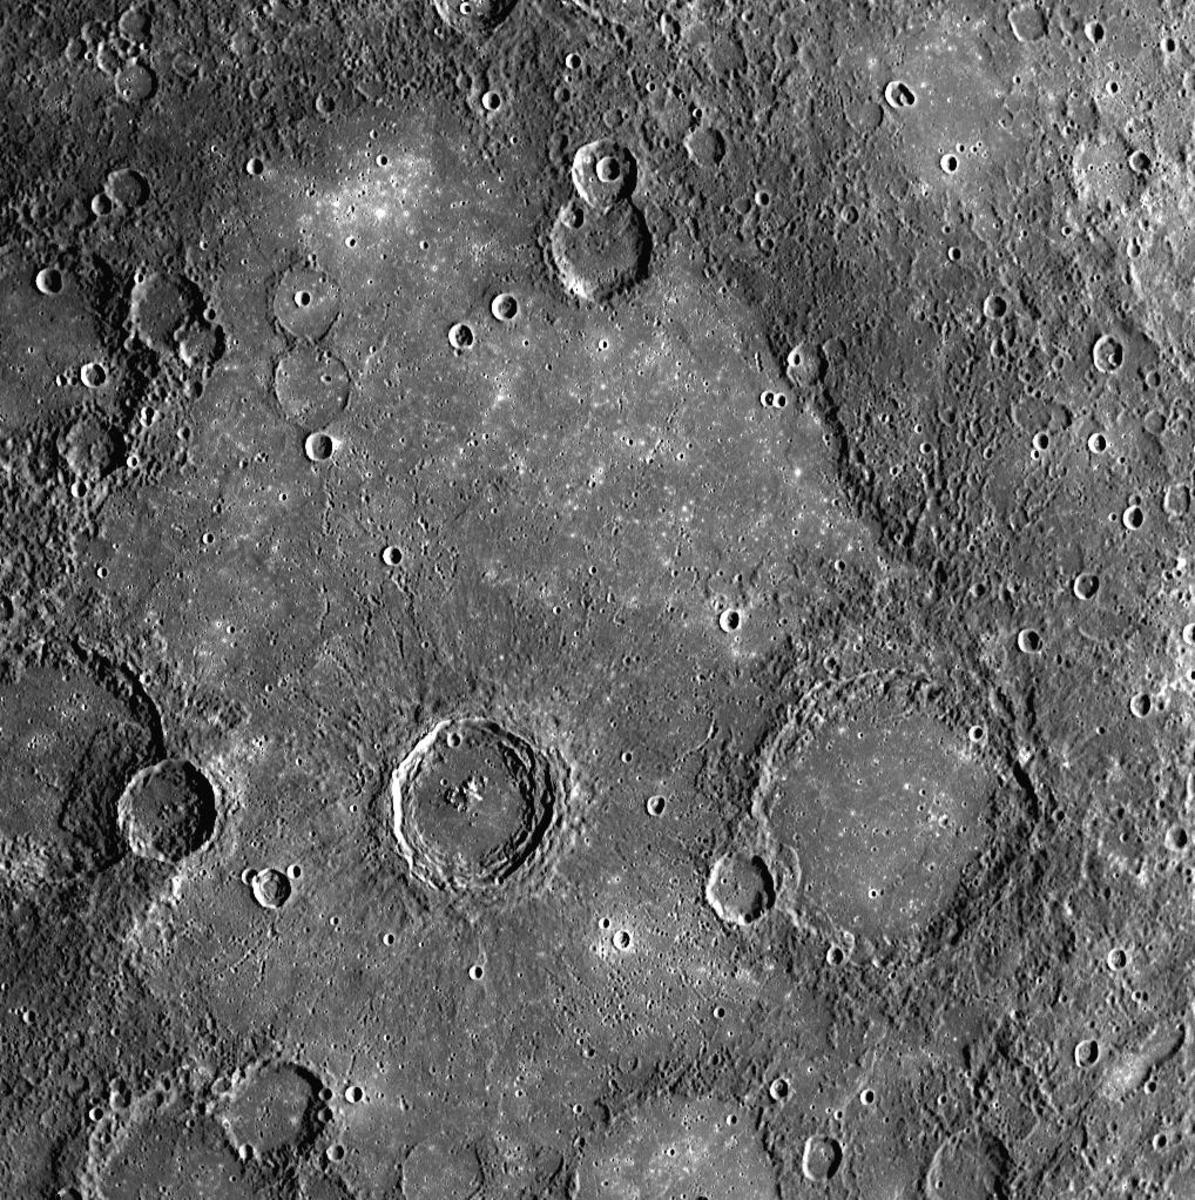 A Volcanic Plain on Mercury